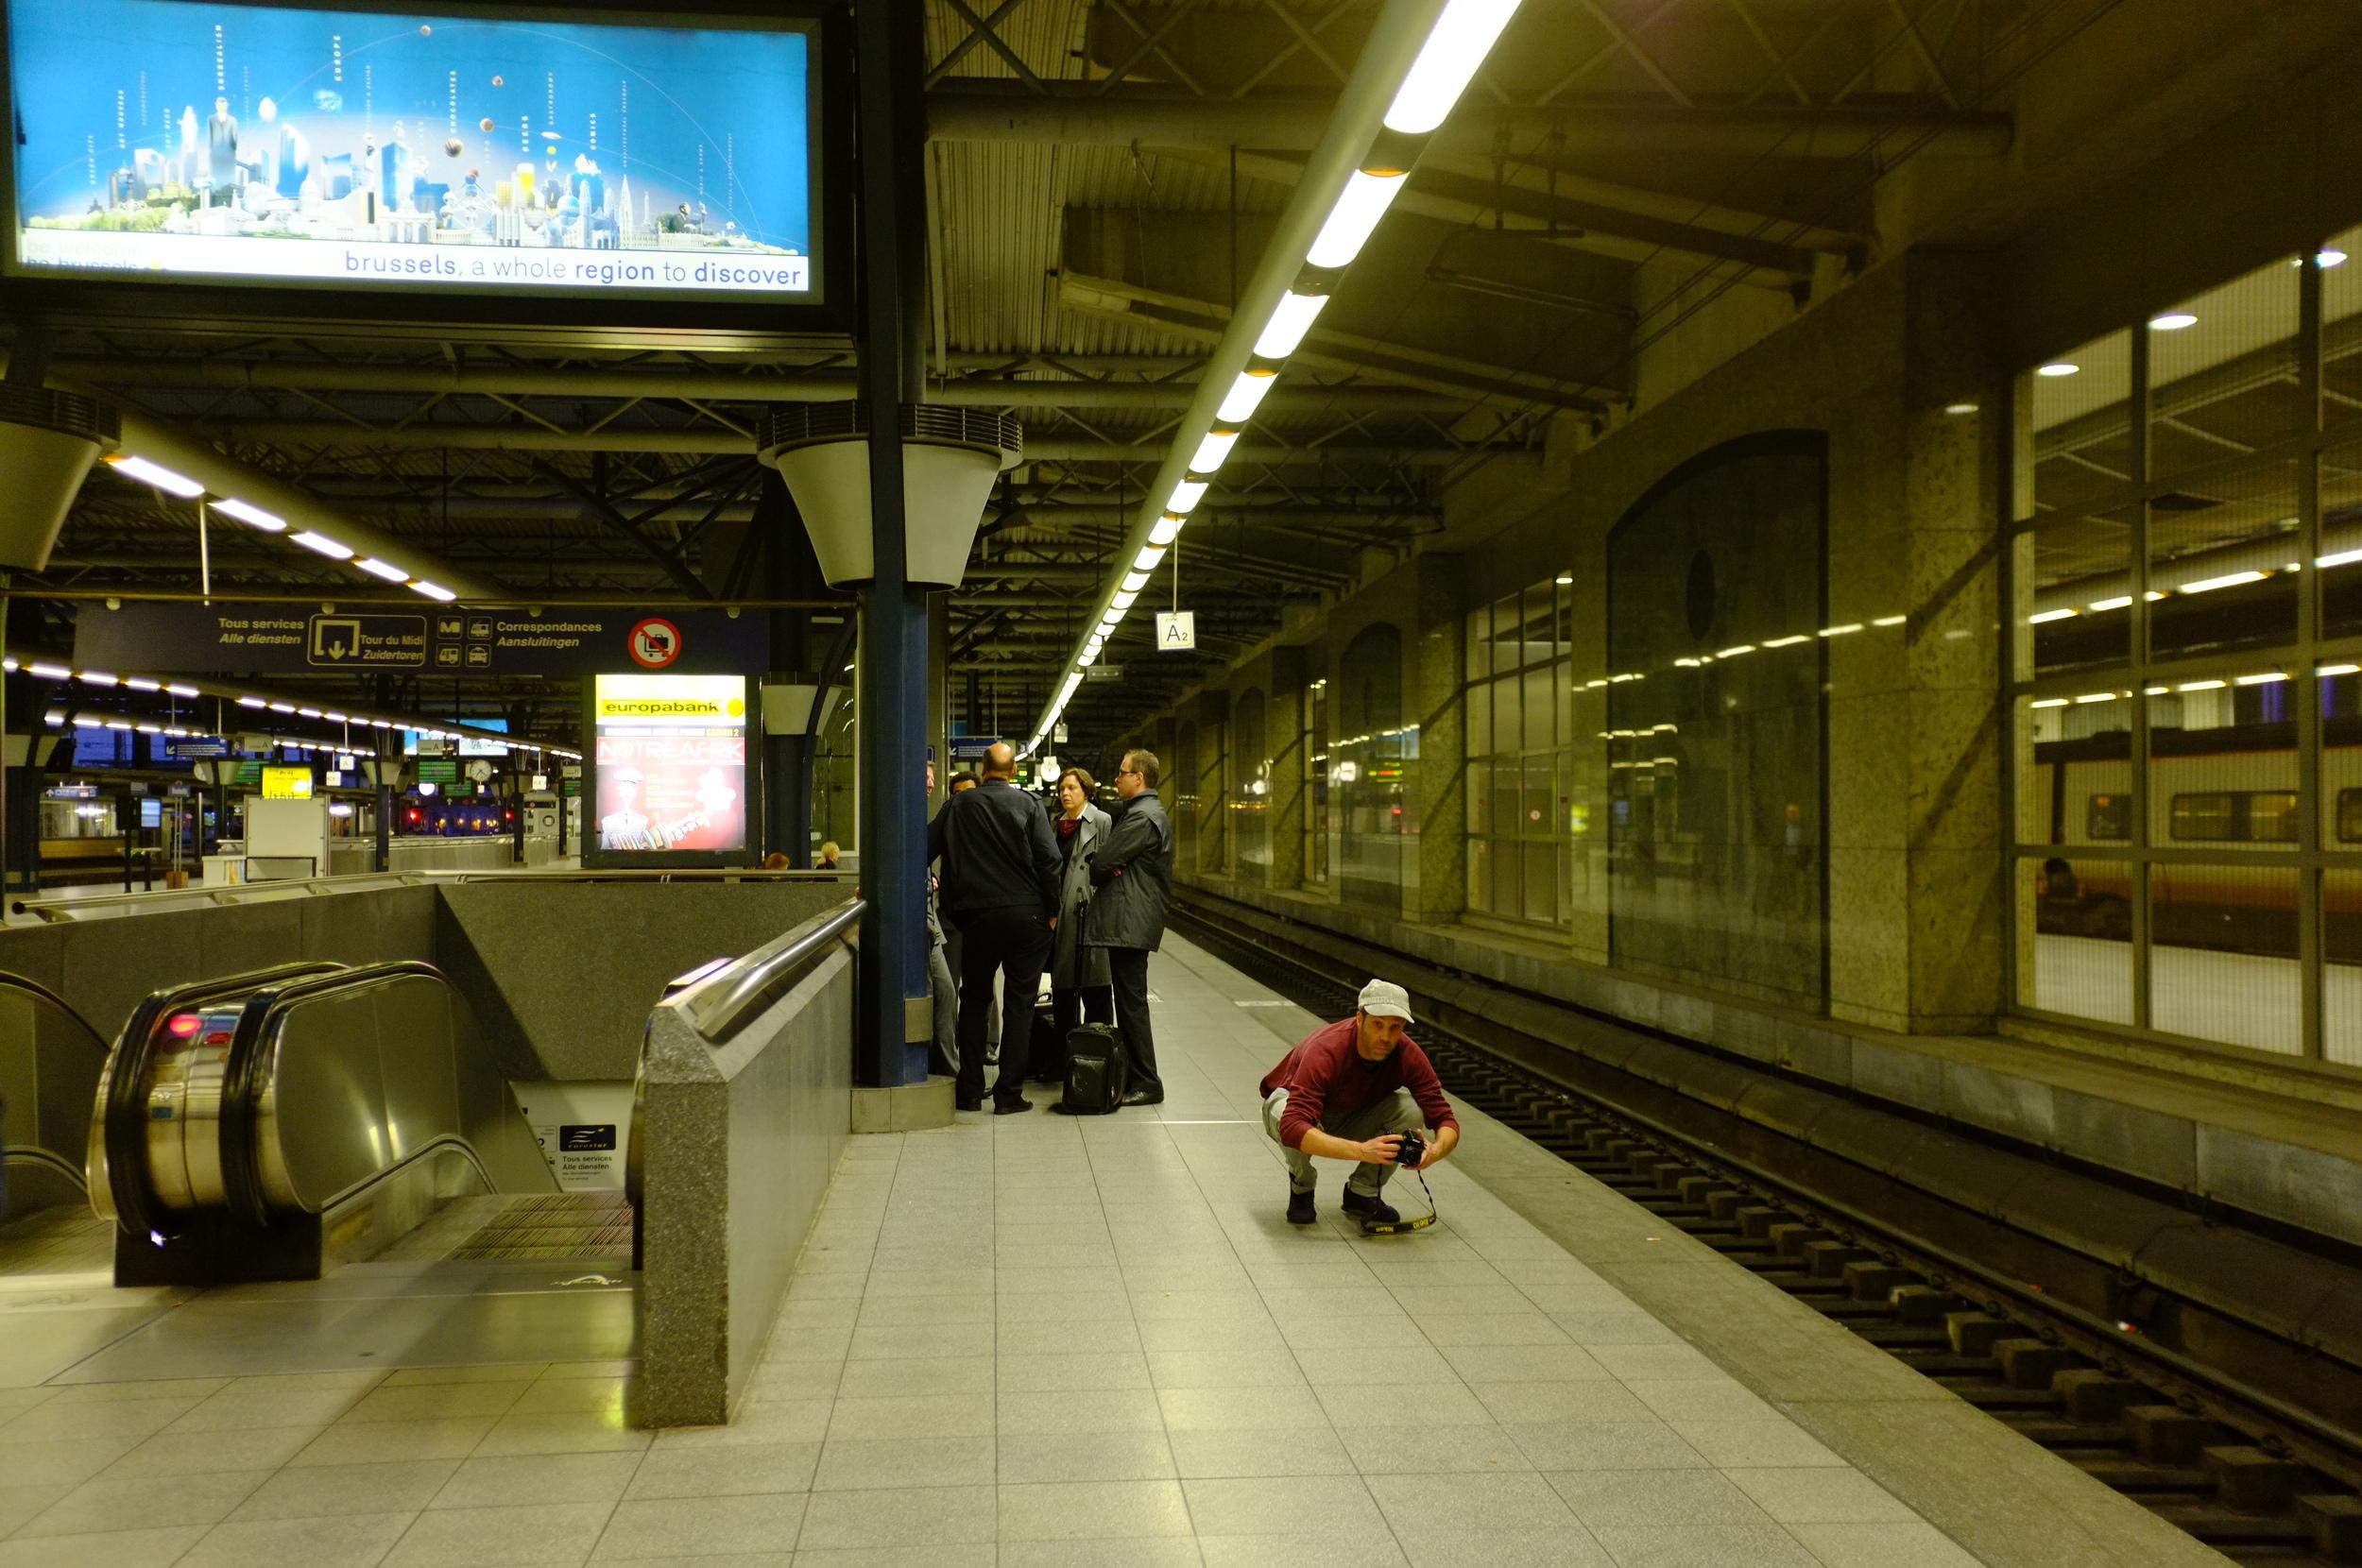 Graham at Brussels Station!